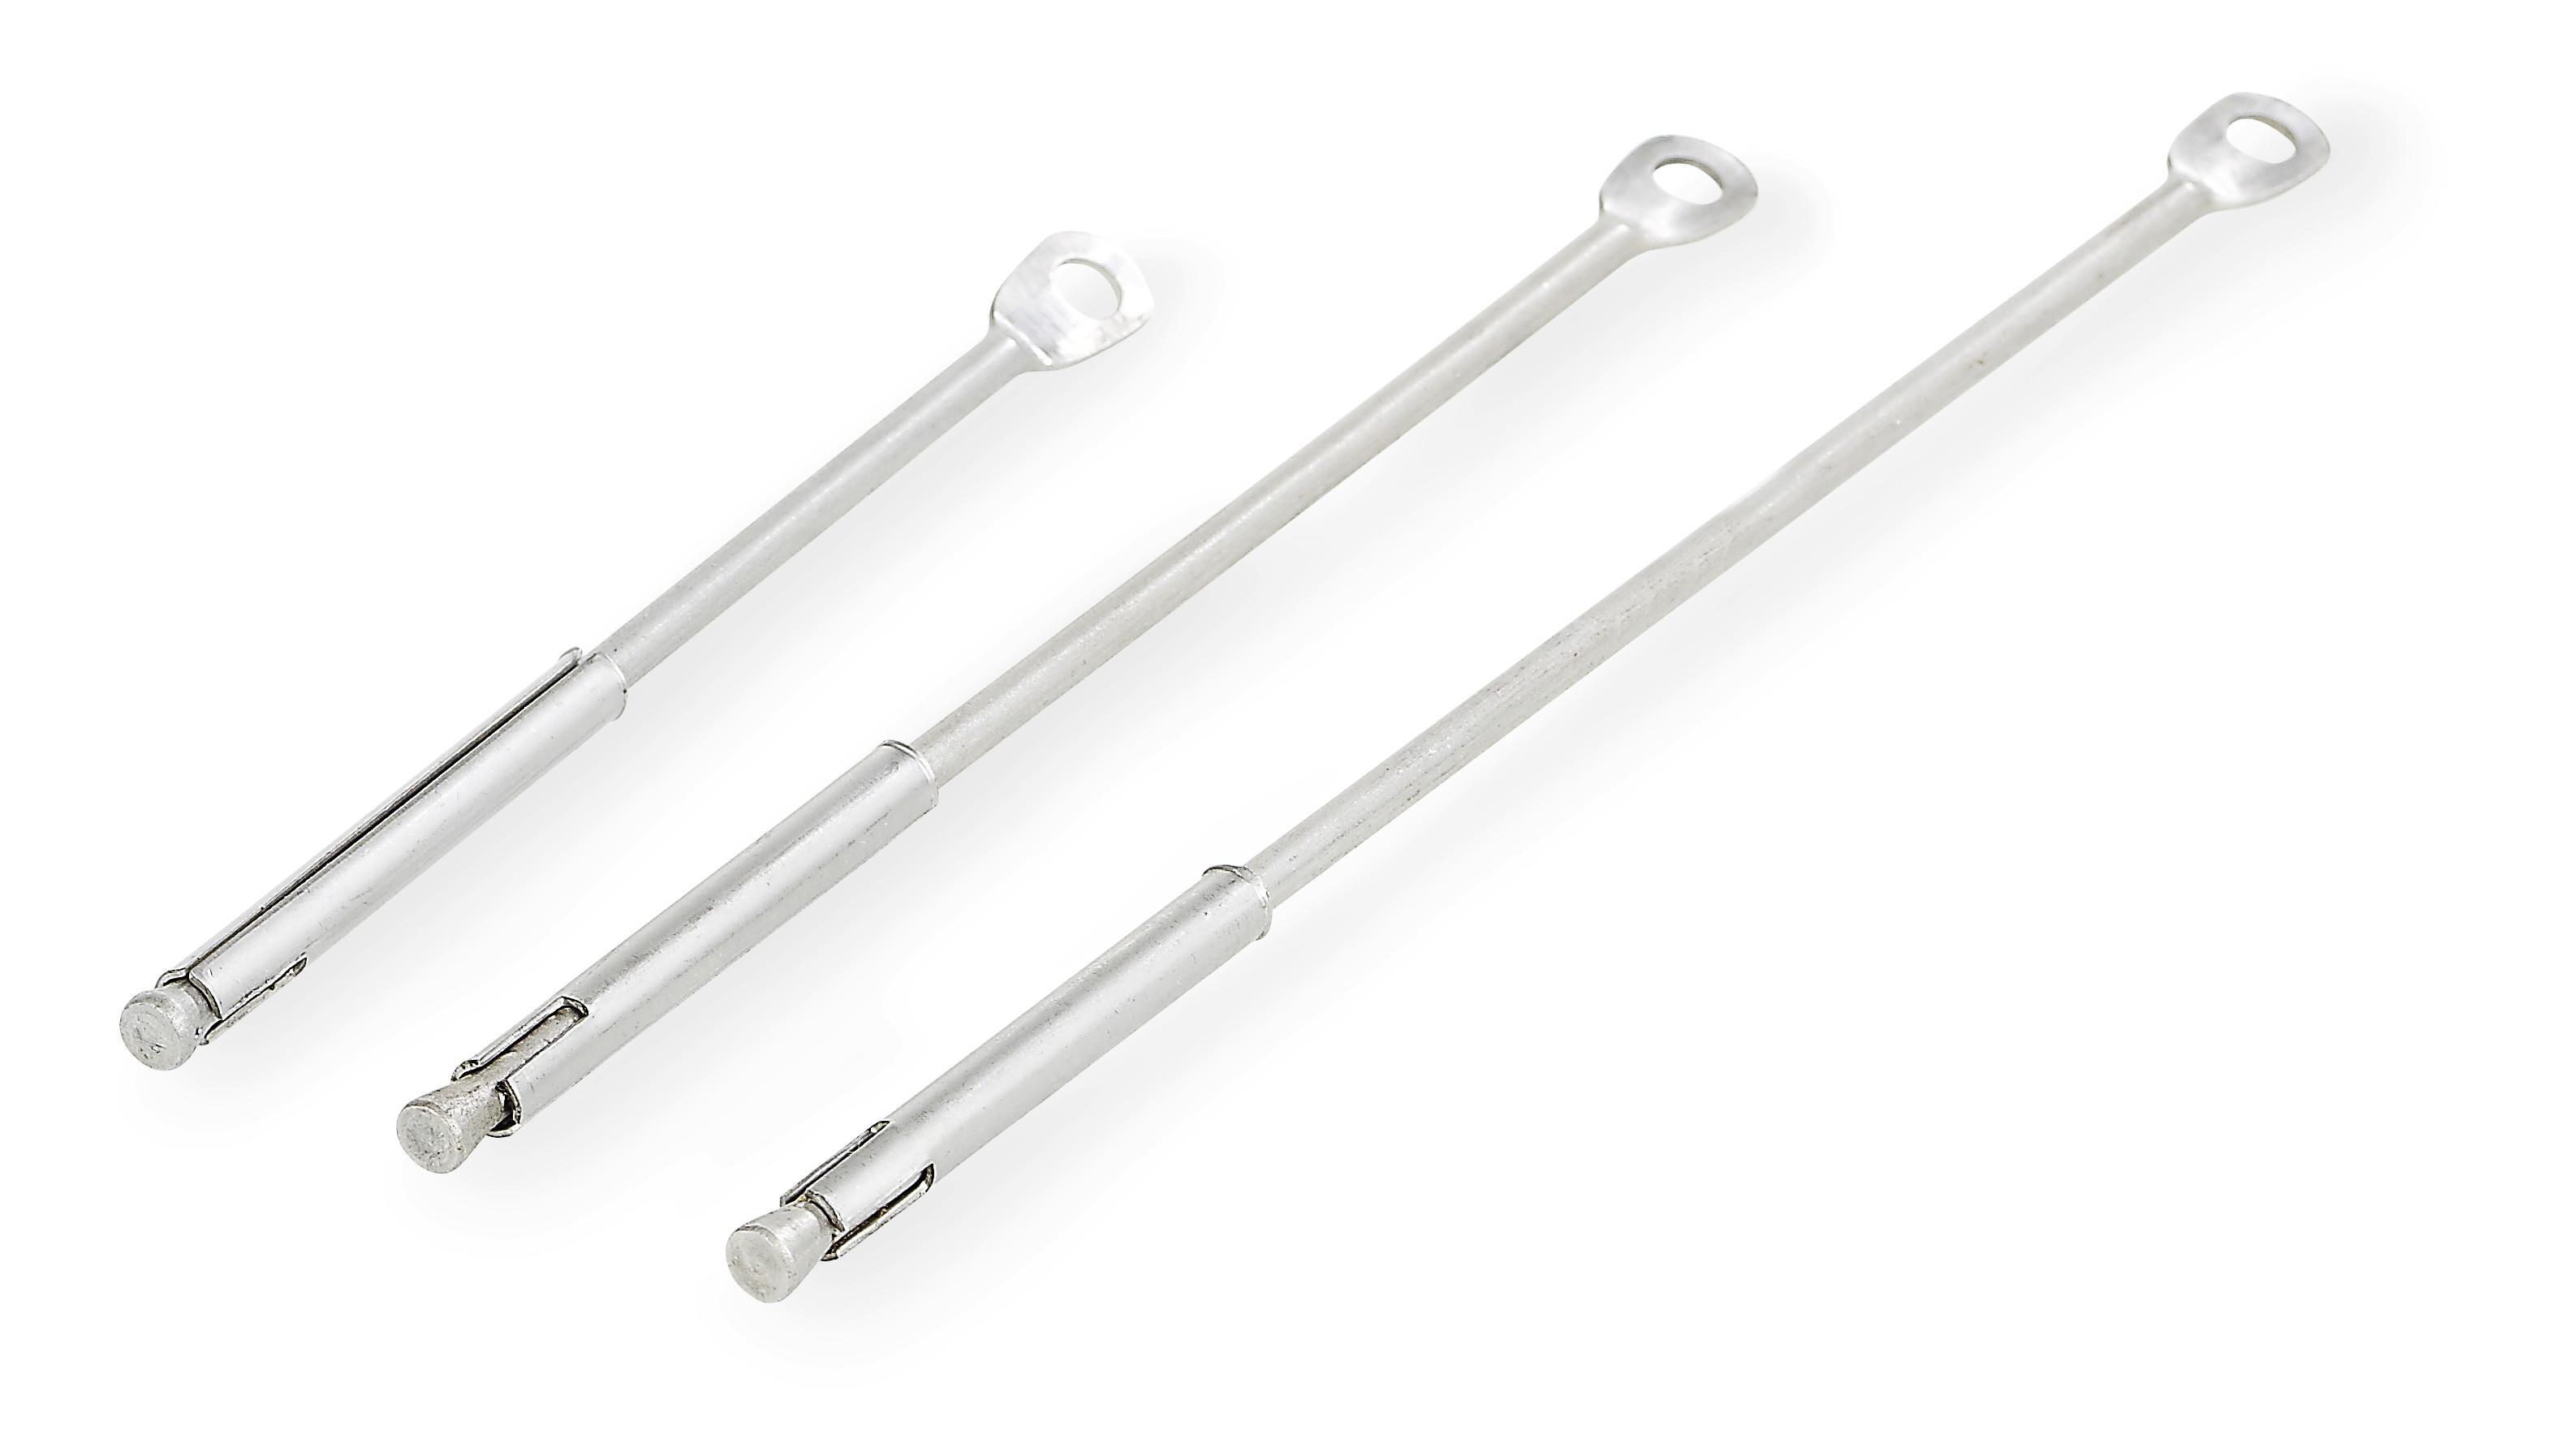 Joma H1400012 Murkramla NR 20 pendel med expander CE-EN845 100-pack DPE 12-120 mm